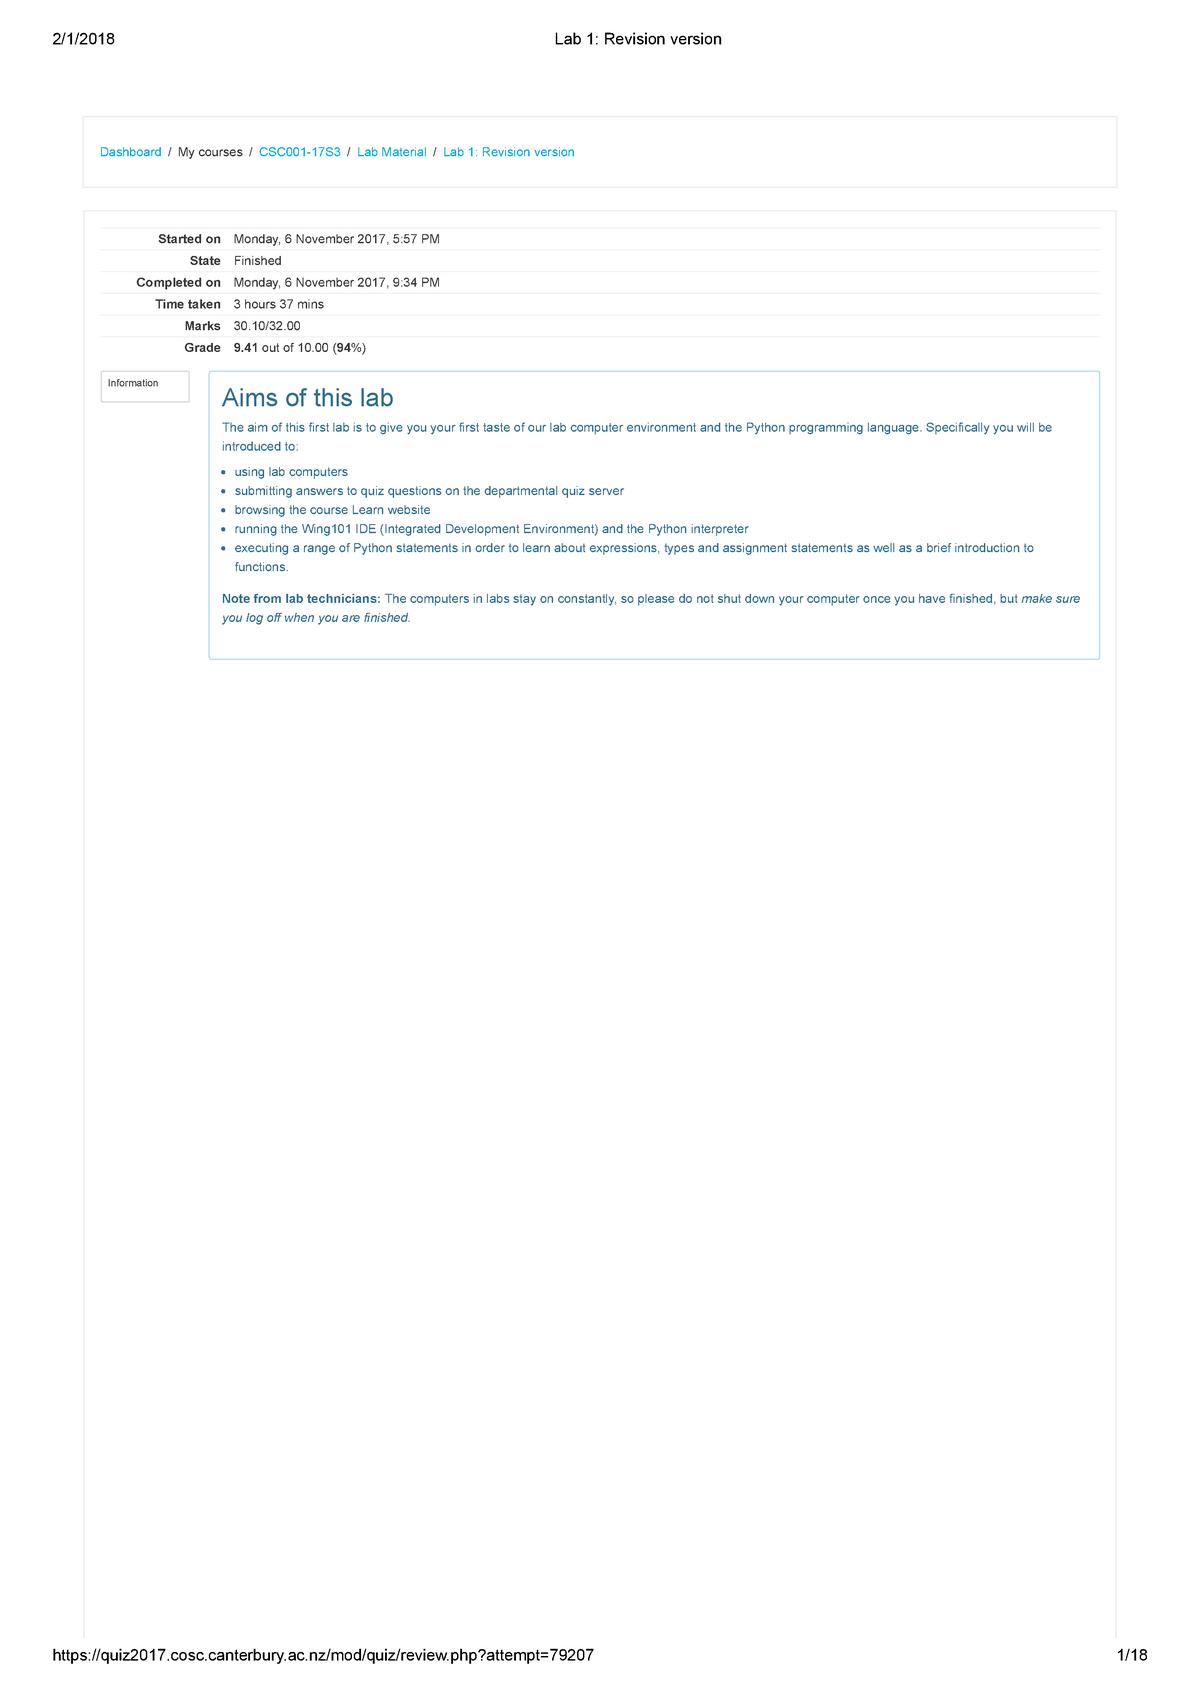 Lab 1 Revision version - COSC121 - University of Canterbury